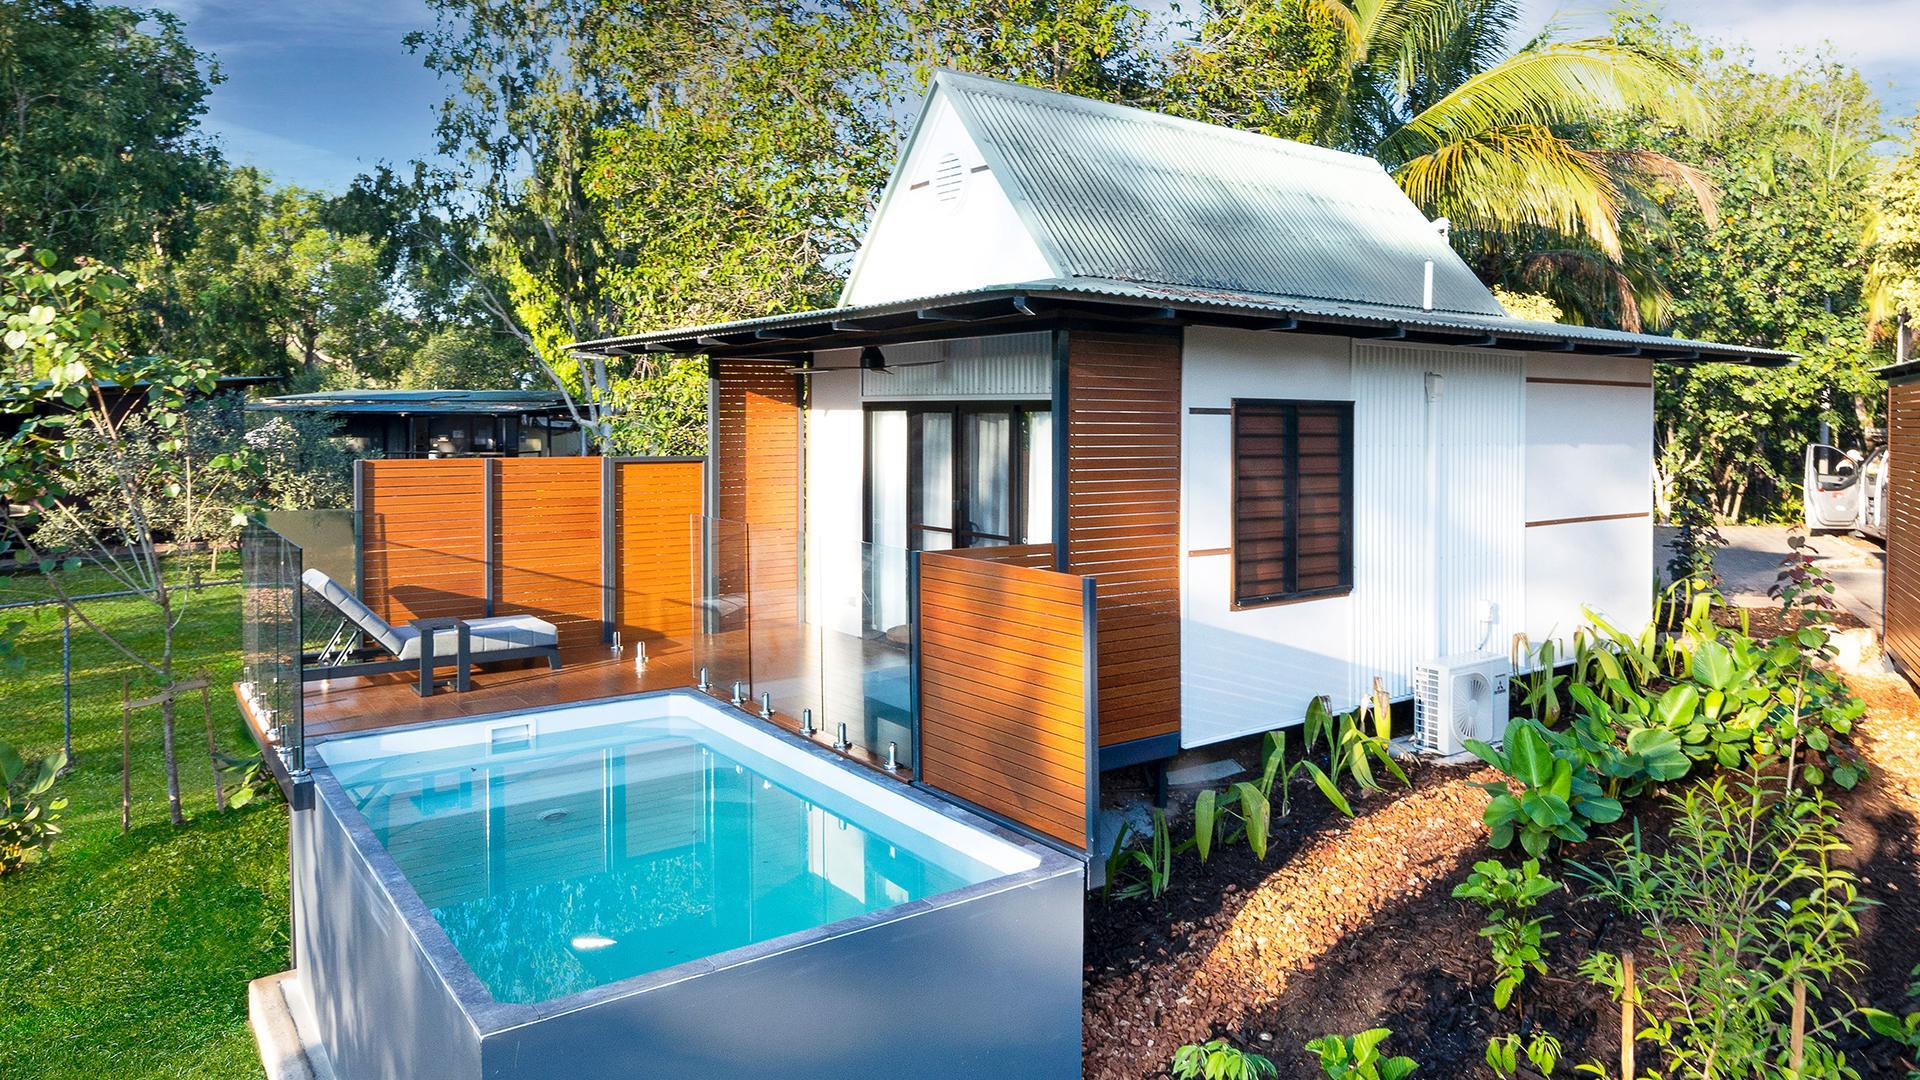 Tropical Pool Villa image 1 at Mercure Darwin Airport Resort by Darwin Municipality, Northern Territory, Australia